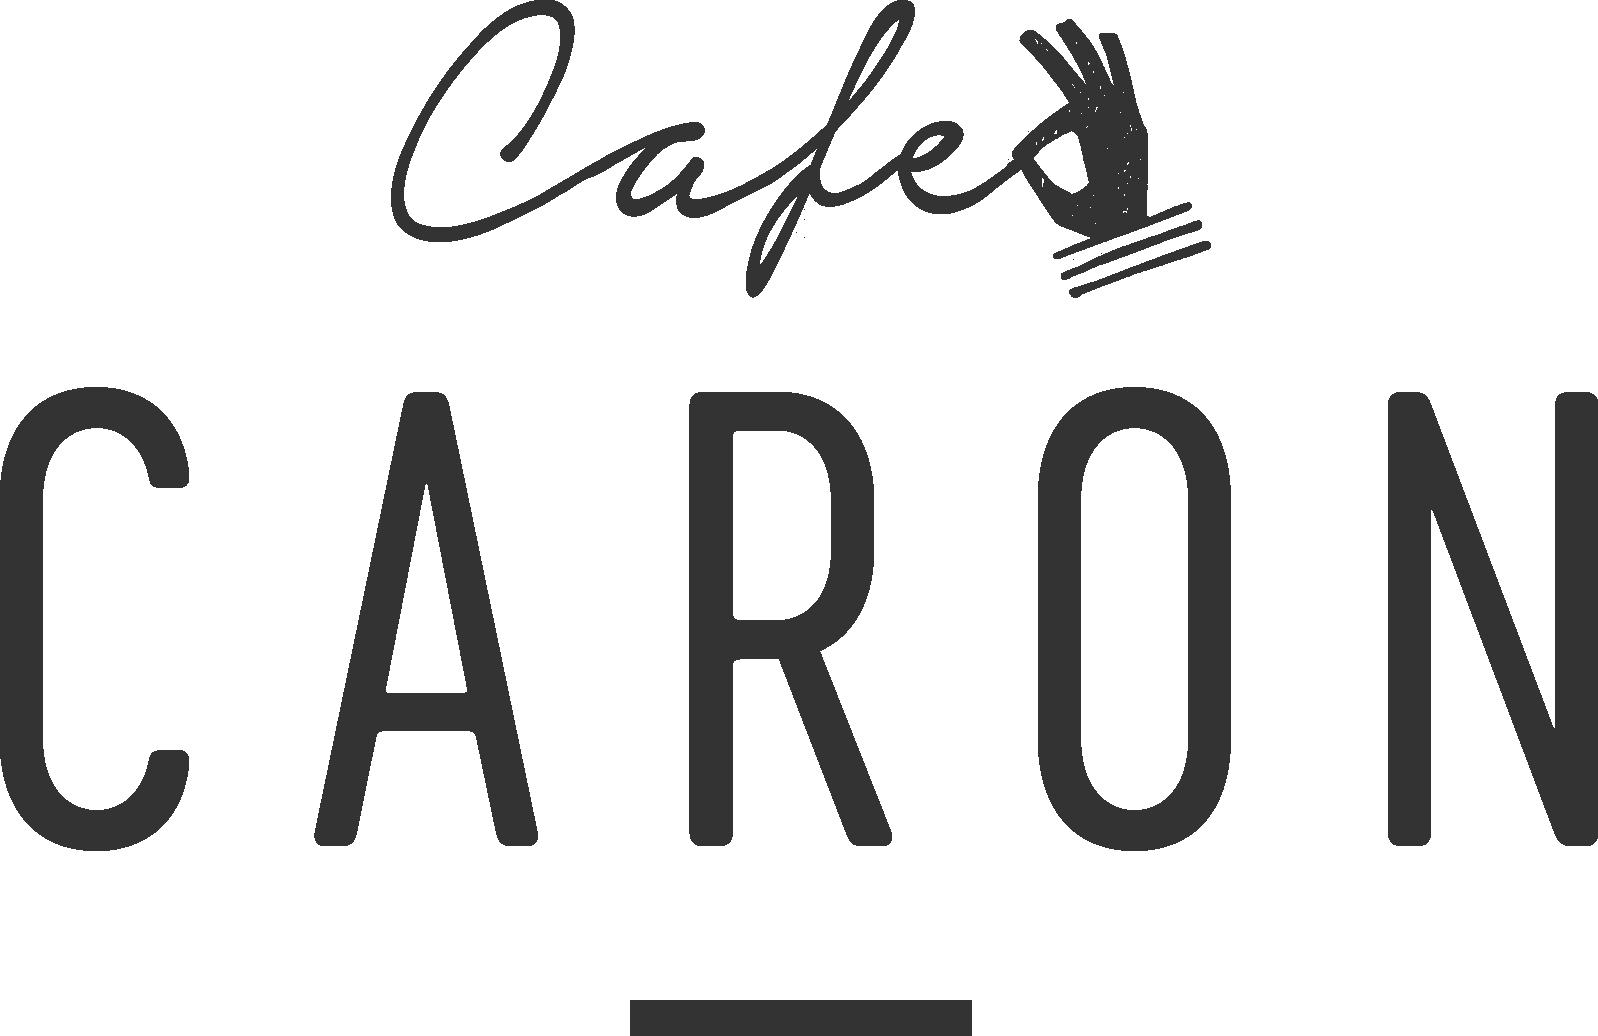 cafe caron